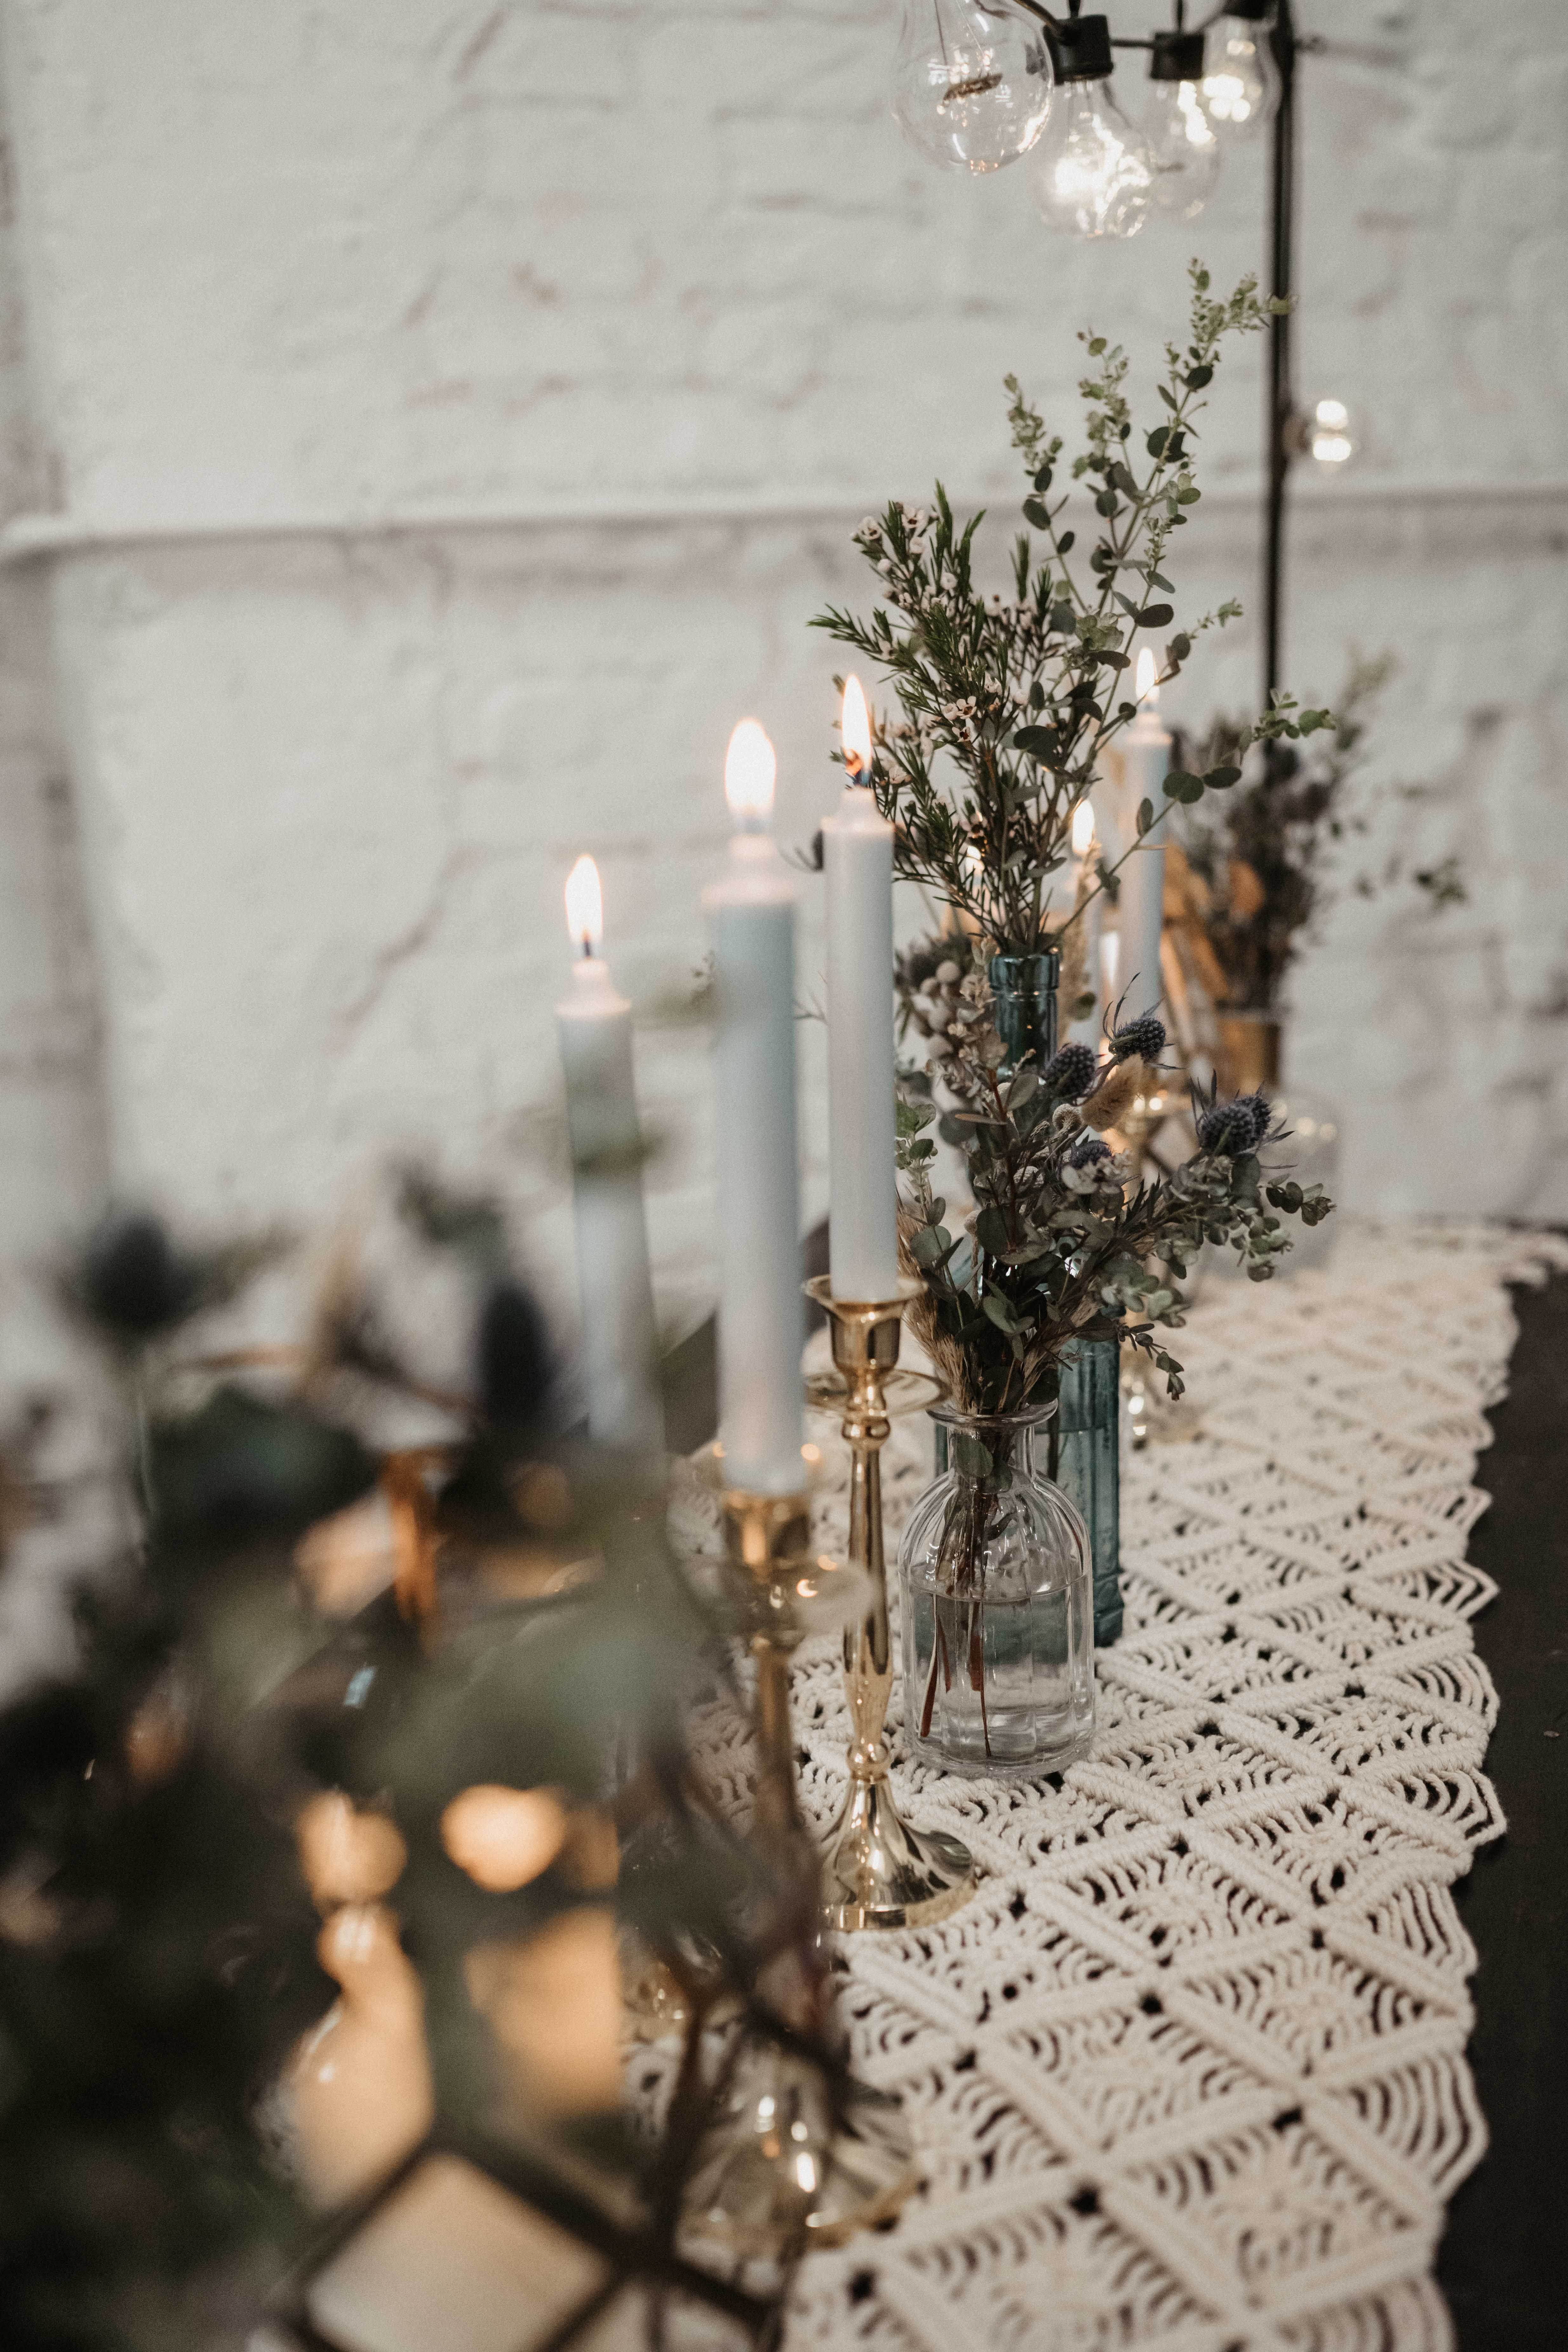 Rauchblaue Kerzen Mit Goldakzenten Passen Wunderbar Auf Den